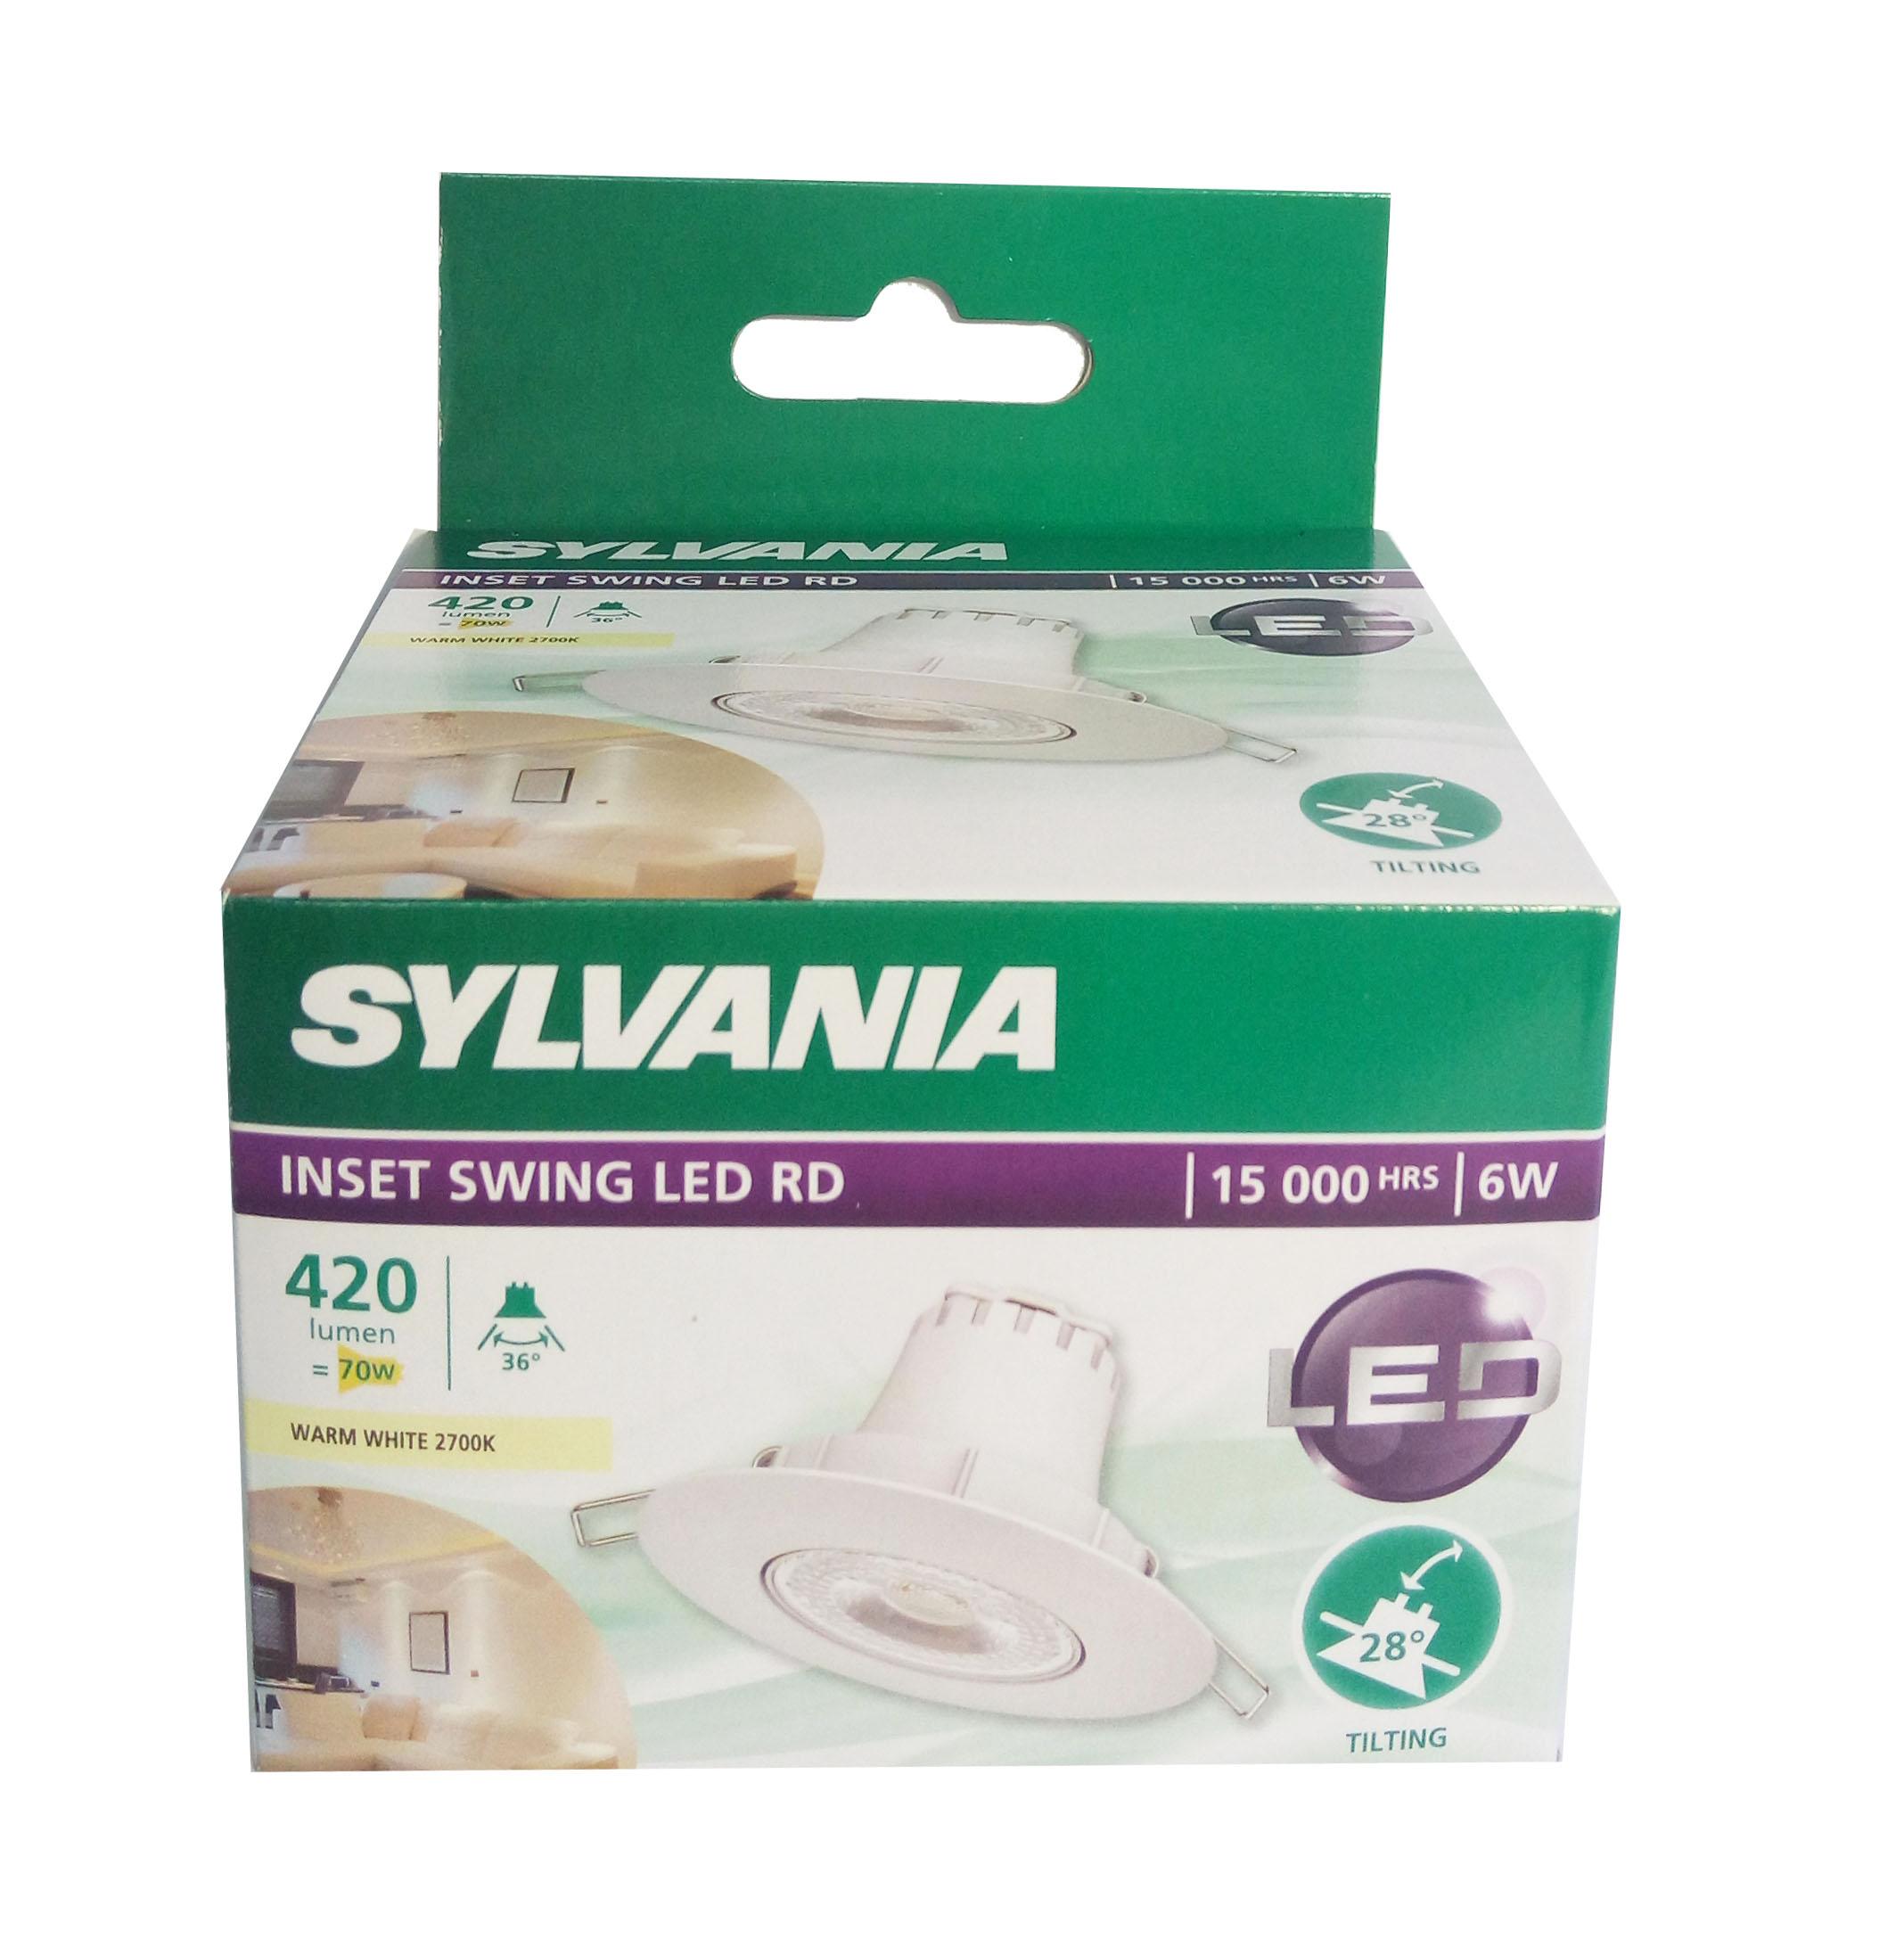 SYLVANIA โคม Inset Swing LED RD_6W  แสง 2700K(วอร์มไวท์) หน้ากลม